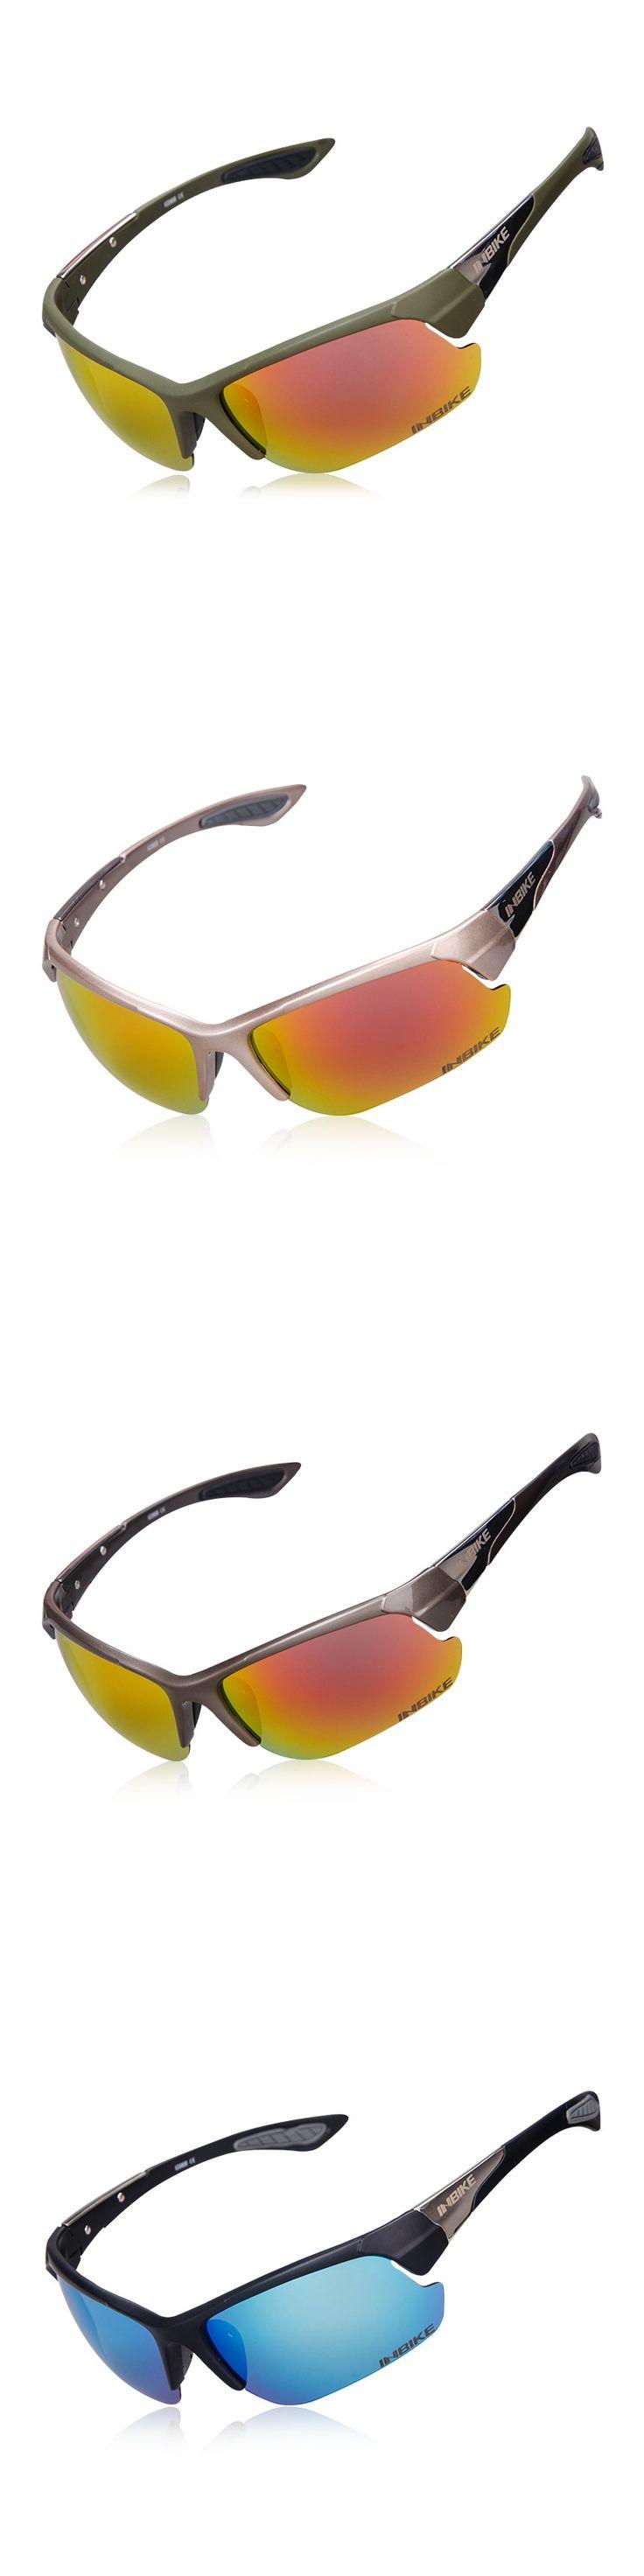 Inbike Cycling Eyewear Wind Proof Glasses Outdoor Polarized Lens Sunglasses Cycling Equipment Ride Bike Glasses Antiskid Eyewear